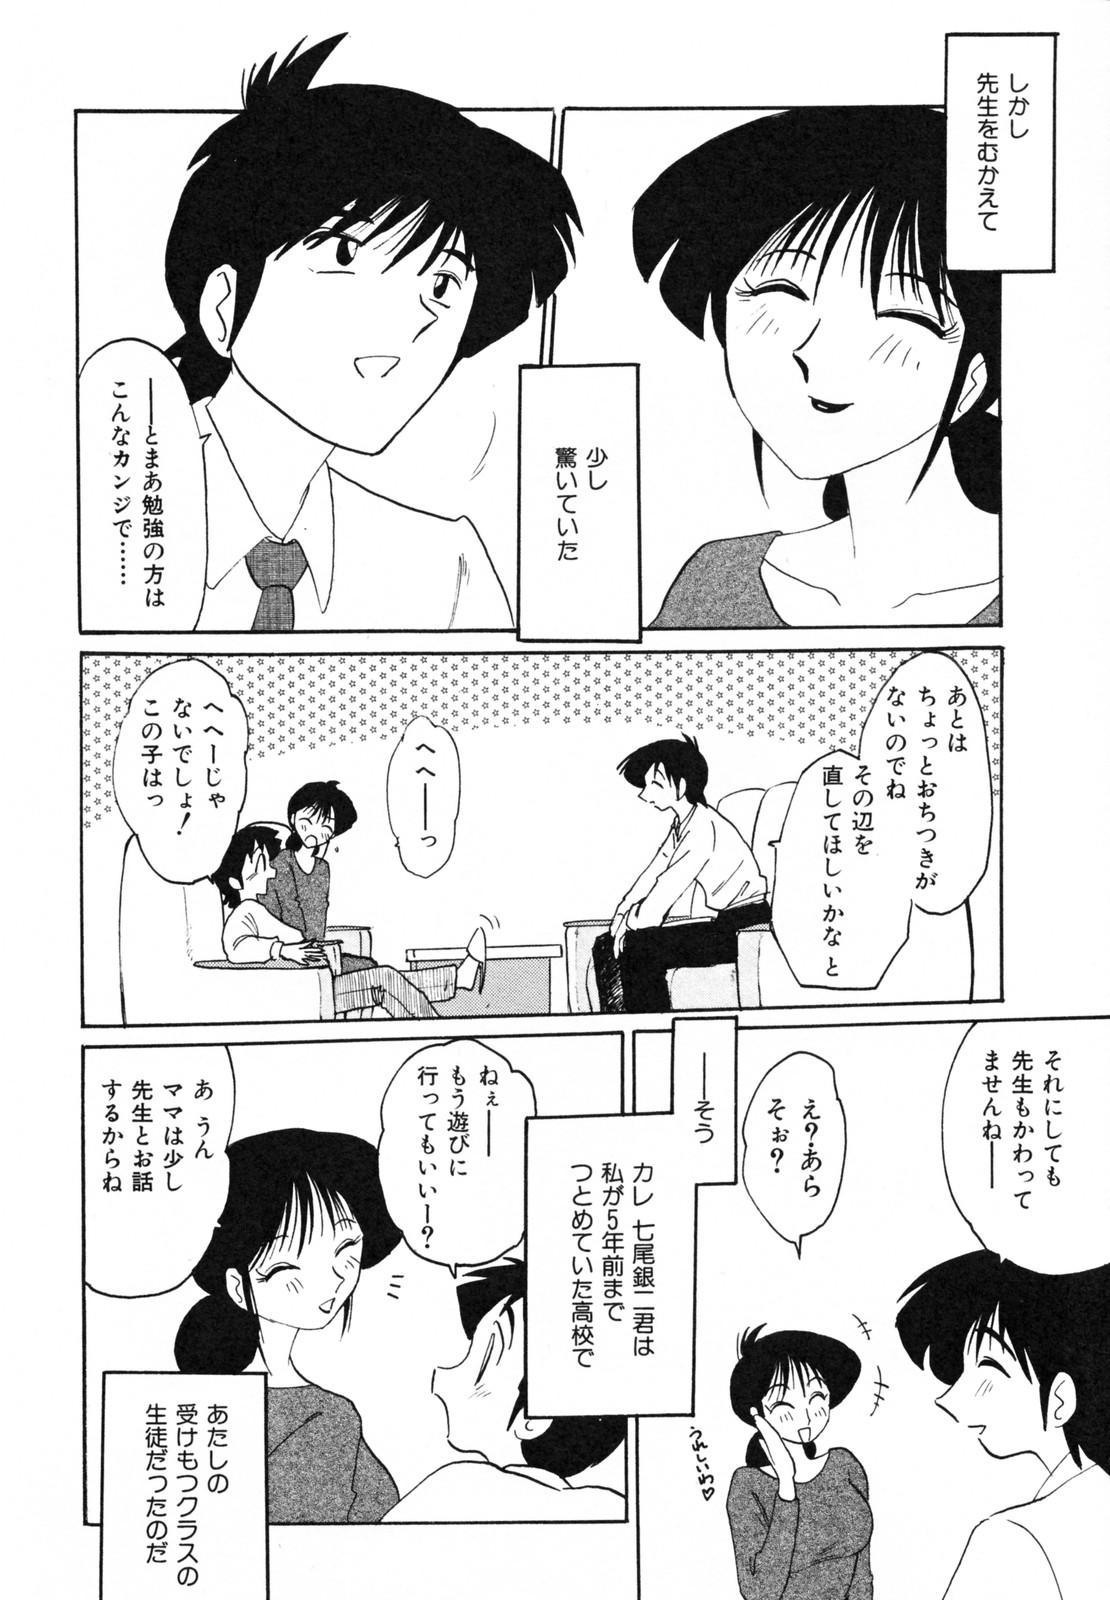 Hisae Haitoku Nikki Kanzenban Jou 167